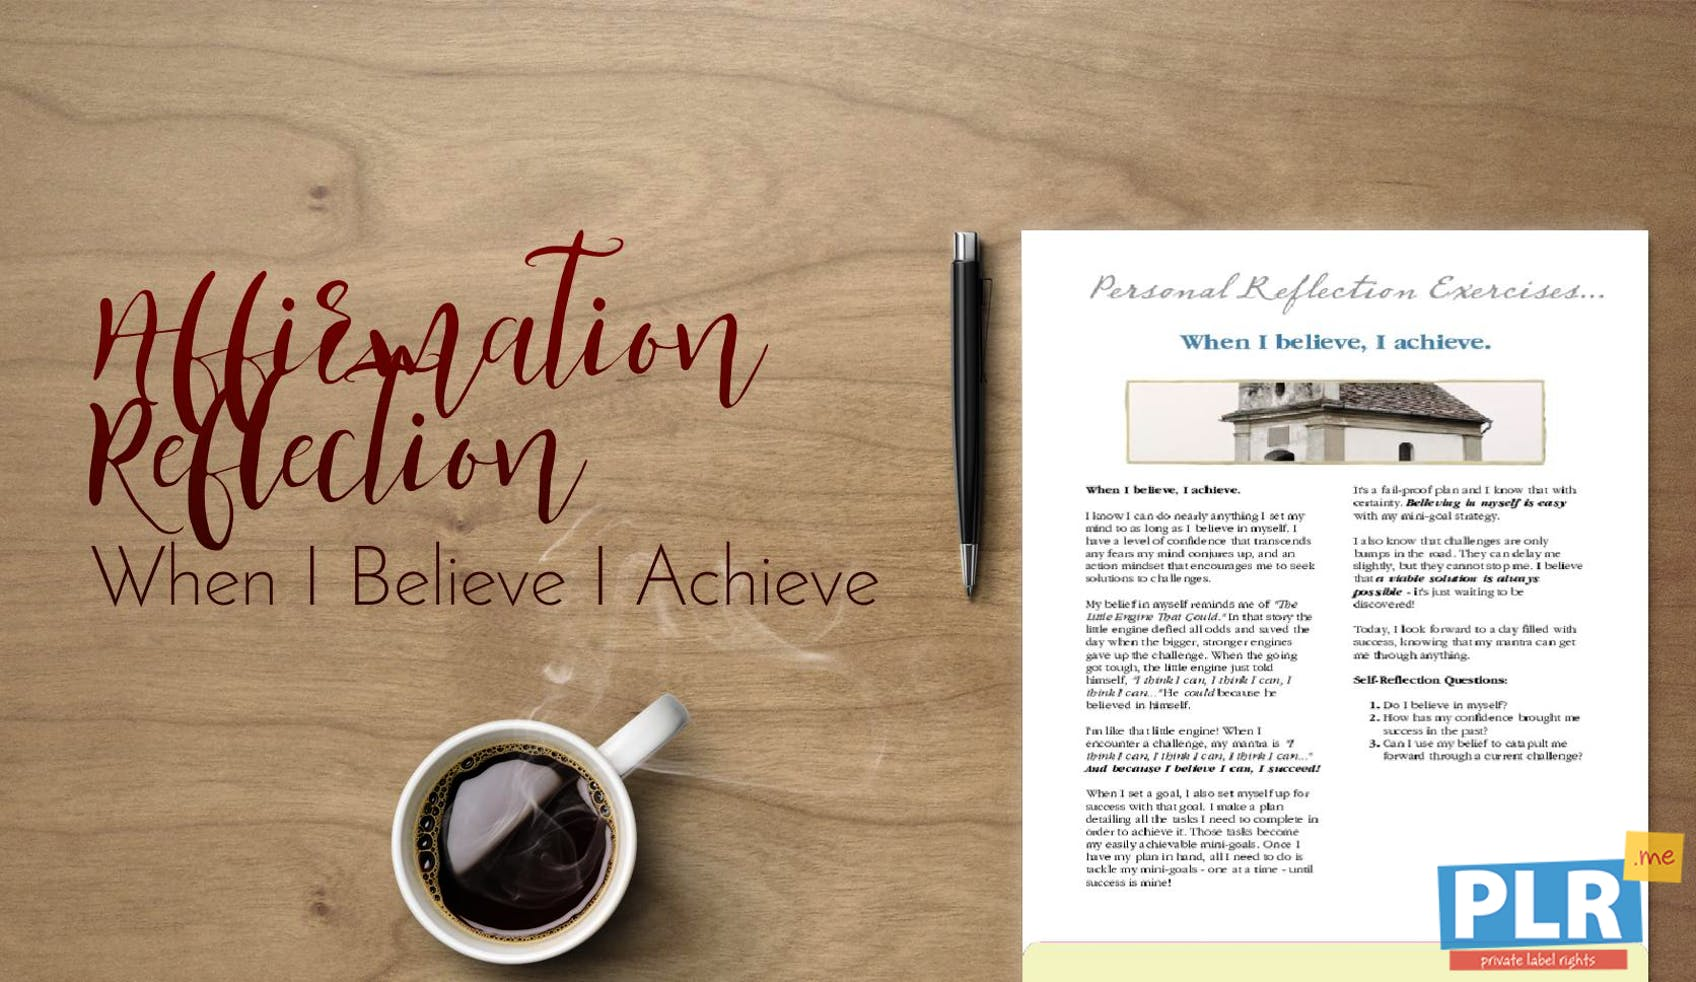 When I Believe I Achieve